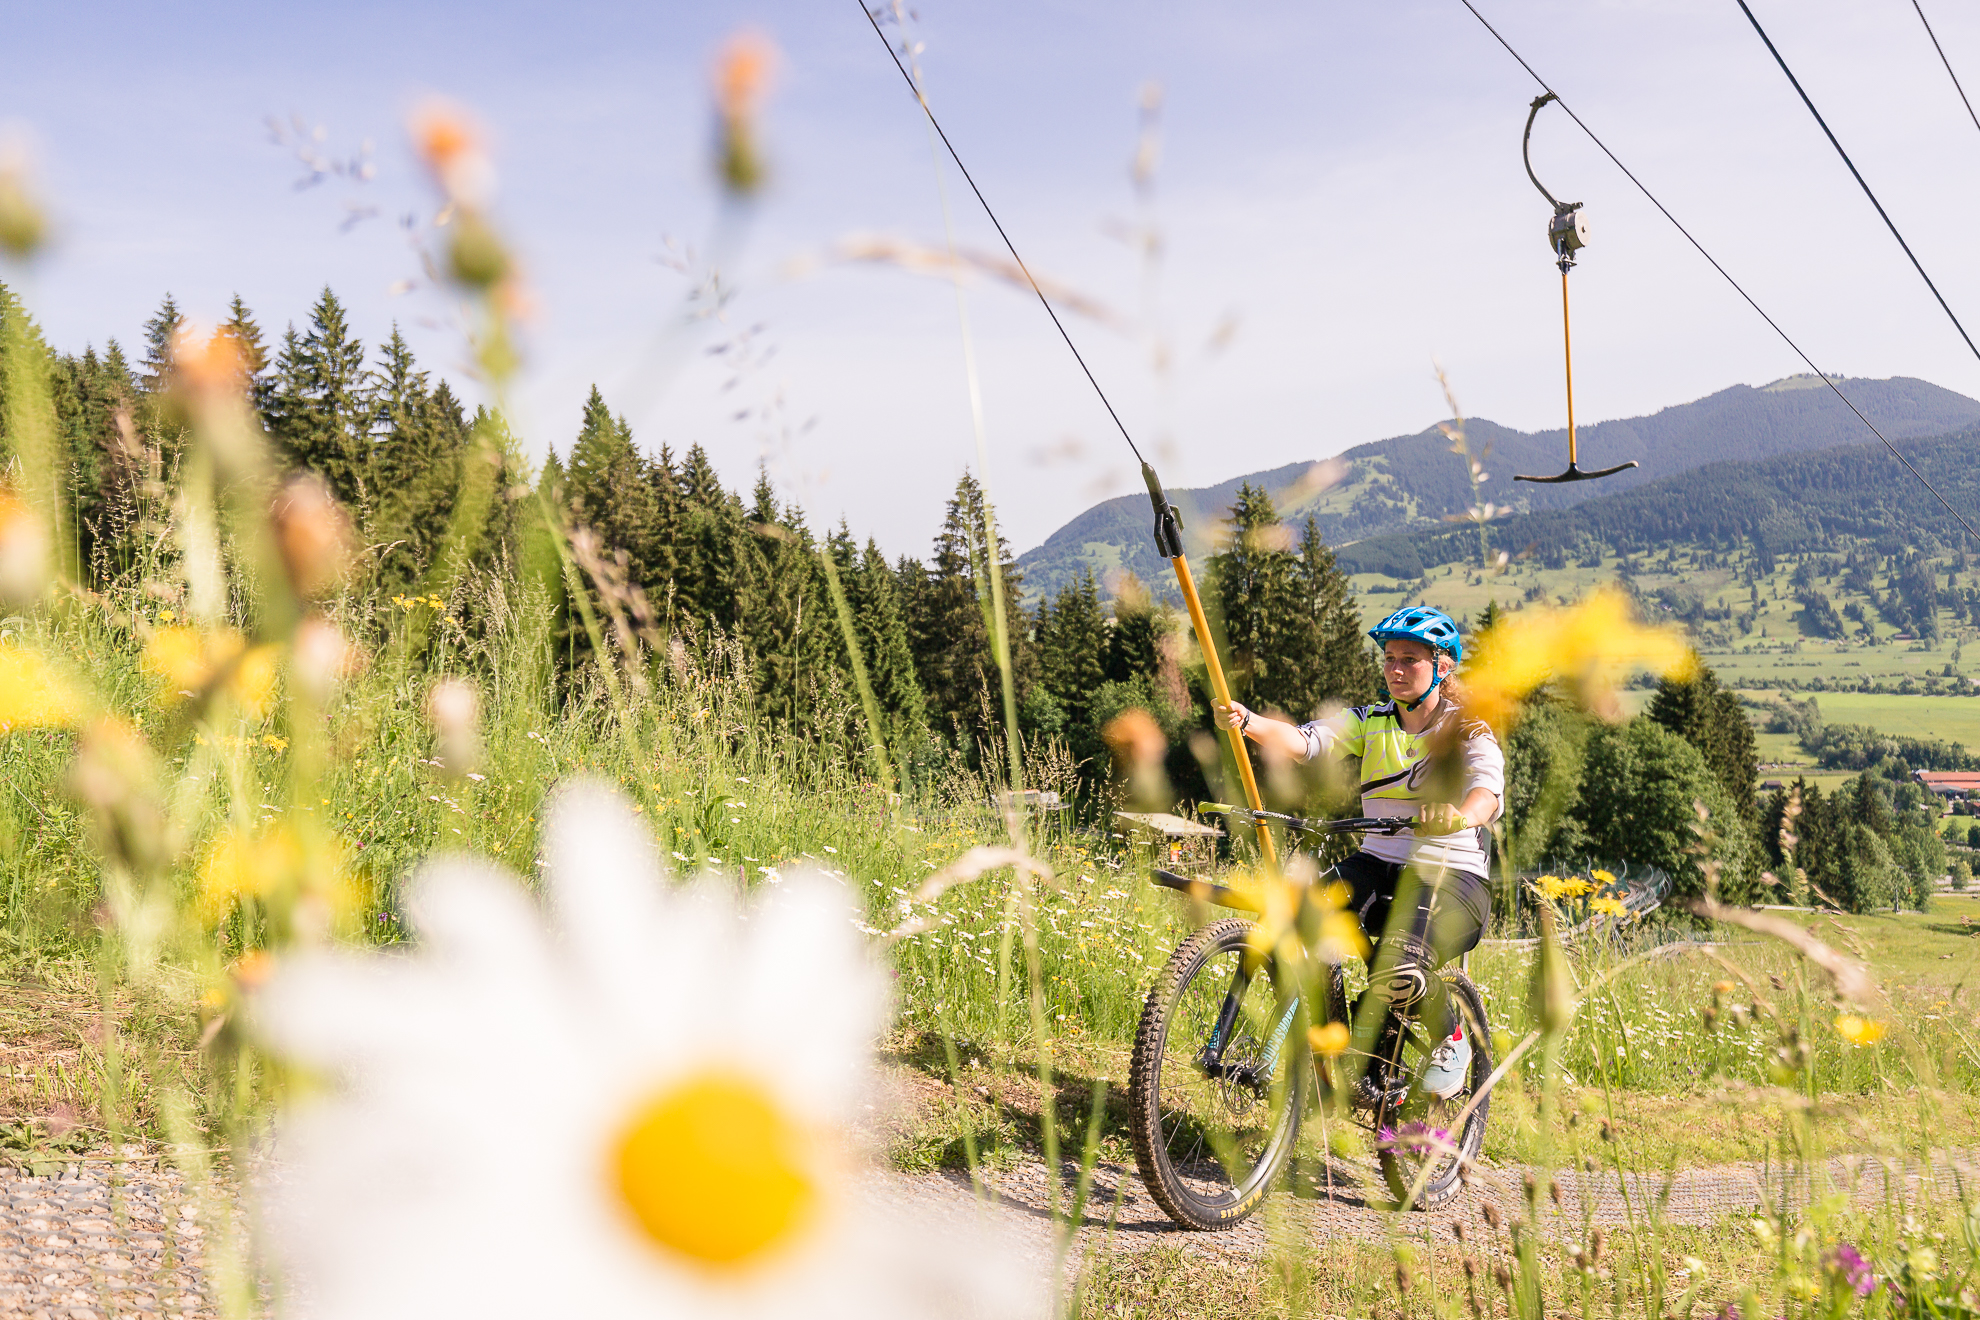 AB_20180611_Bikepark-Oberammergau_077-239.jpg